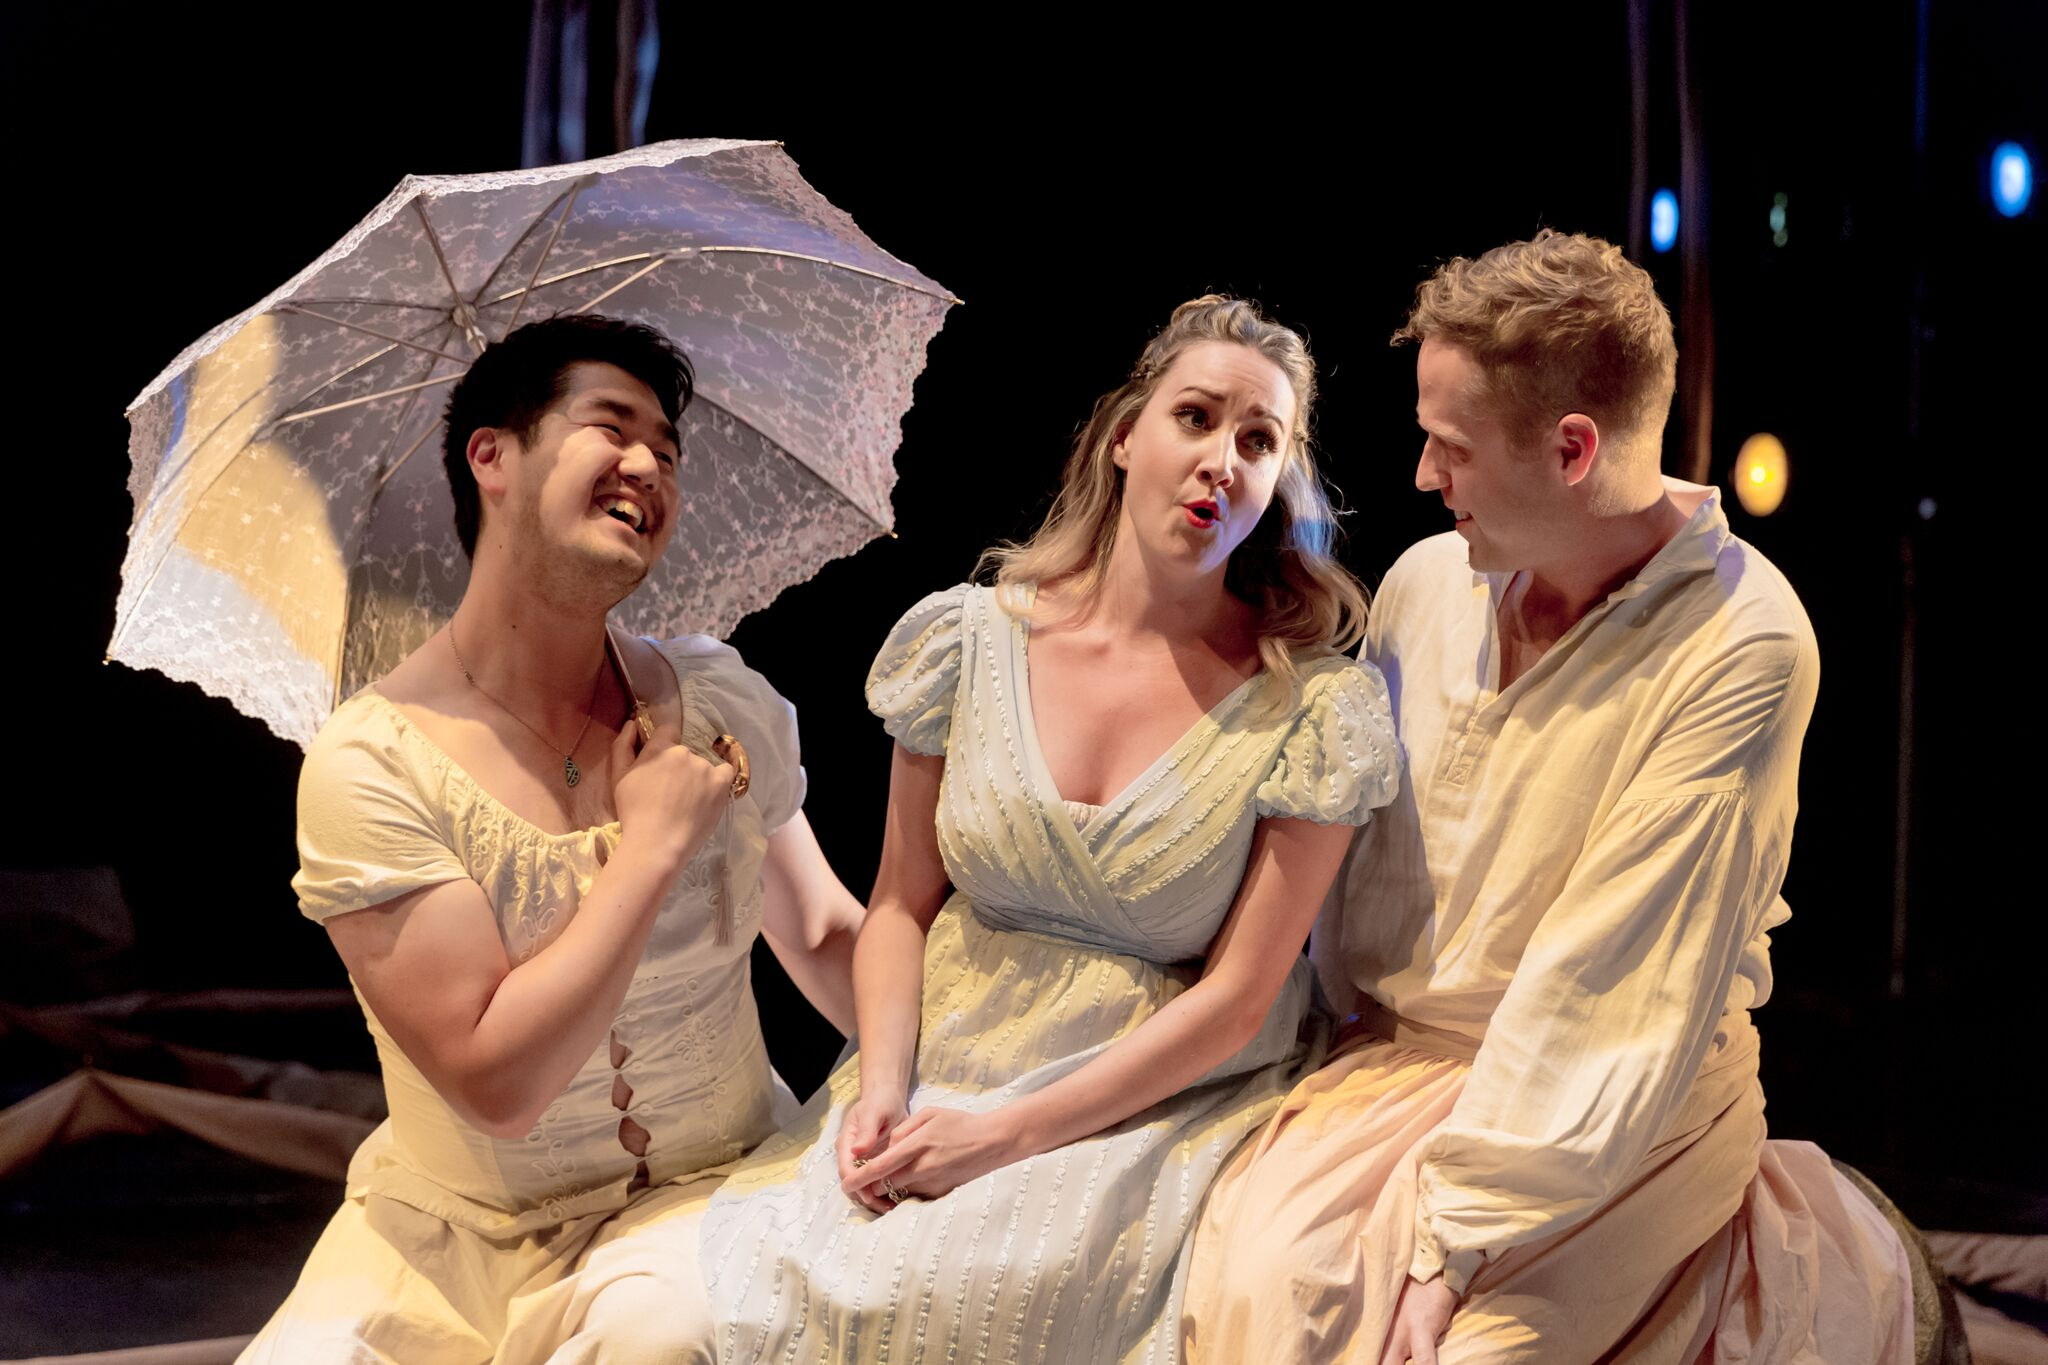 Left to right: William Liu (Chorus) and Rachel Fenlon as Galatea and CD Saint (Chorus); Photo by Diamond's Edge Photography